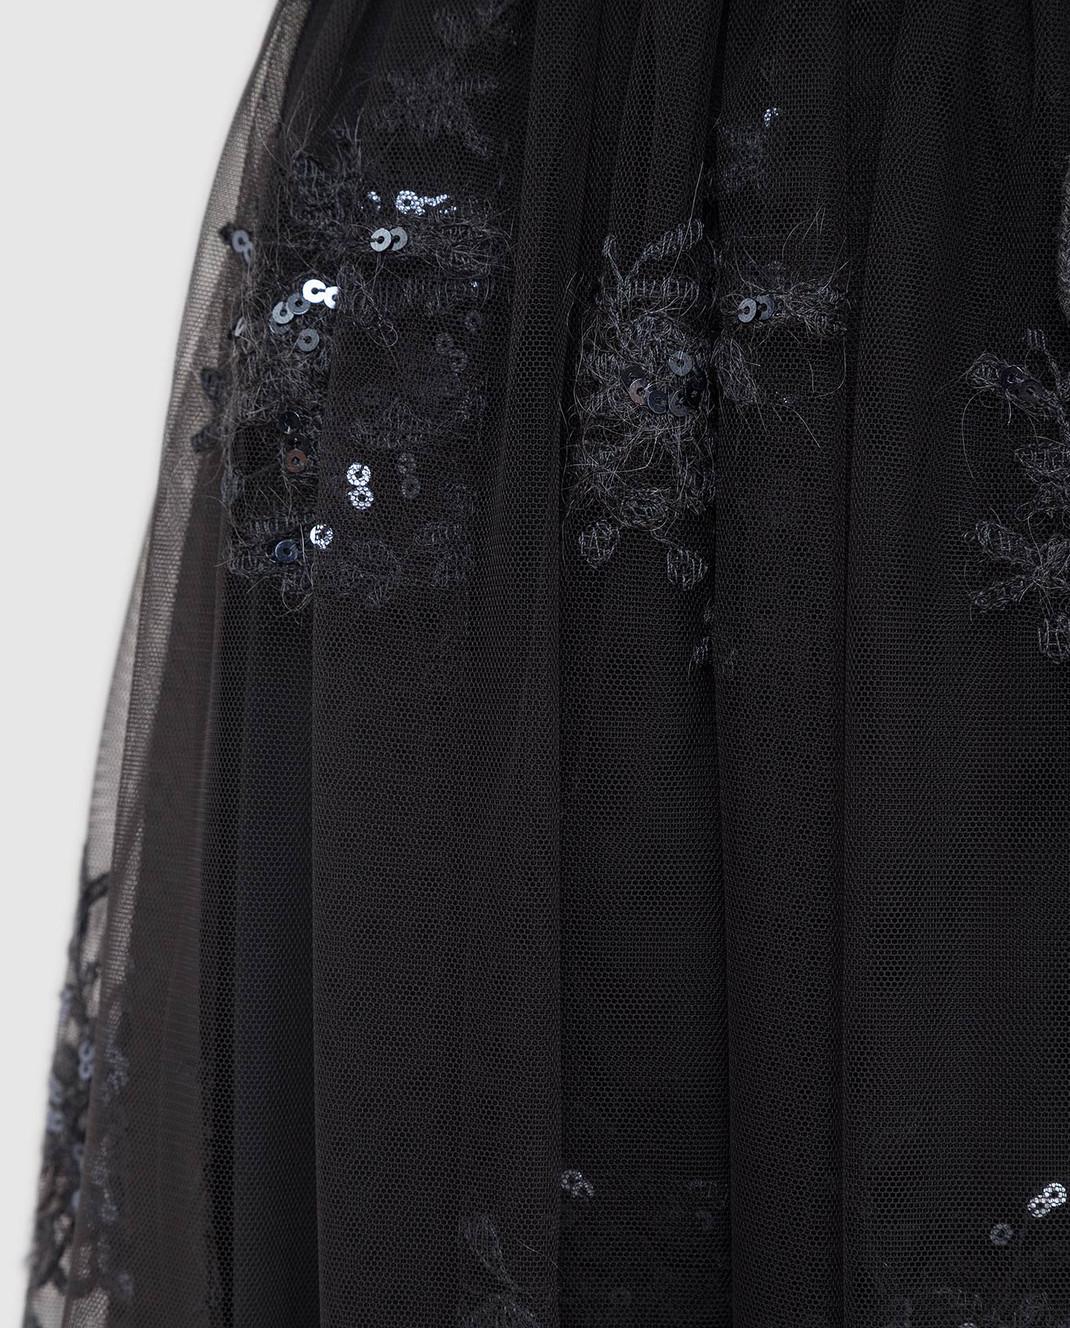 Brunello Cucinelli Темно-серая юбка MA960G2739 изображение 5